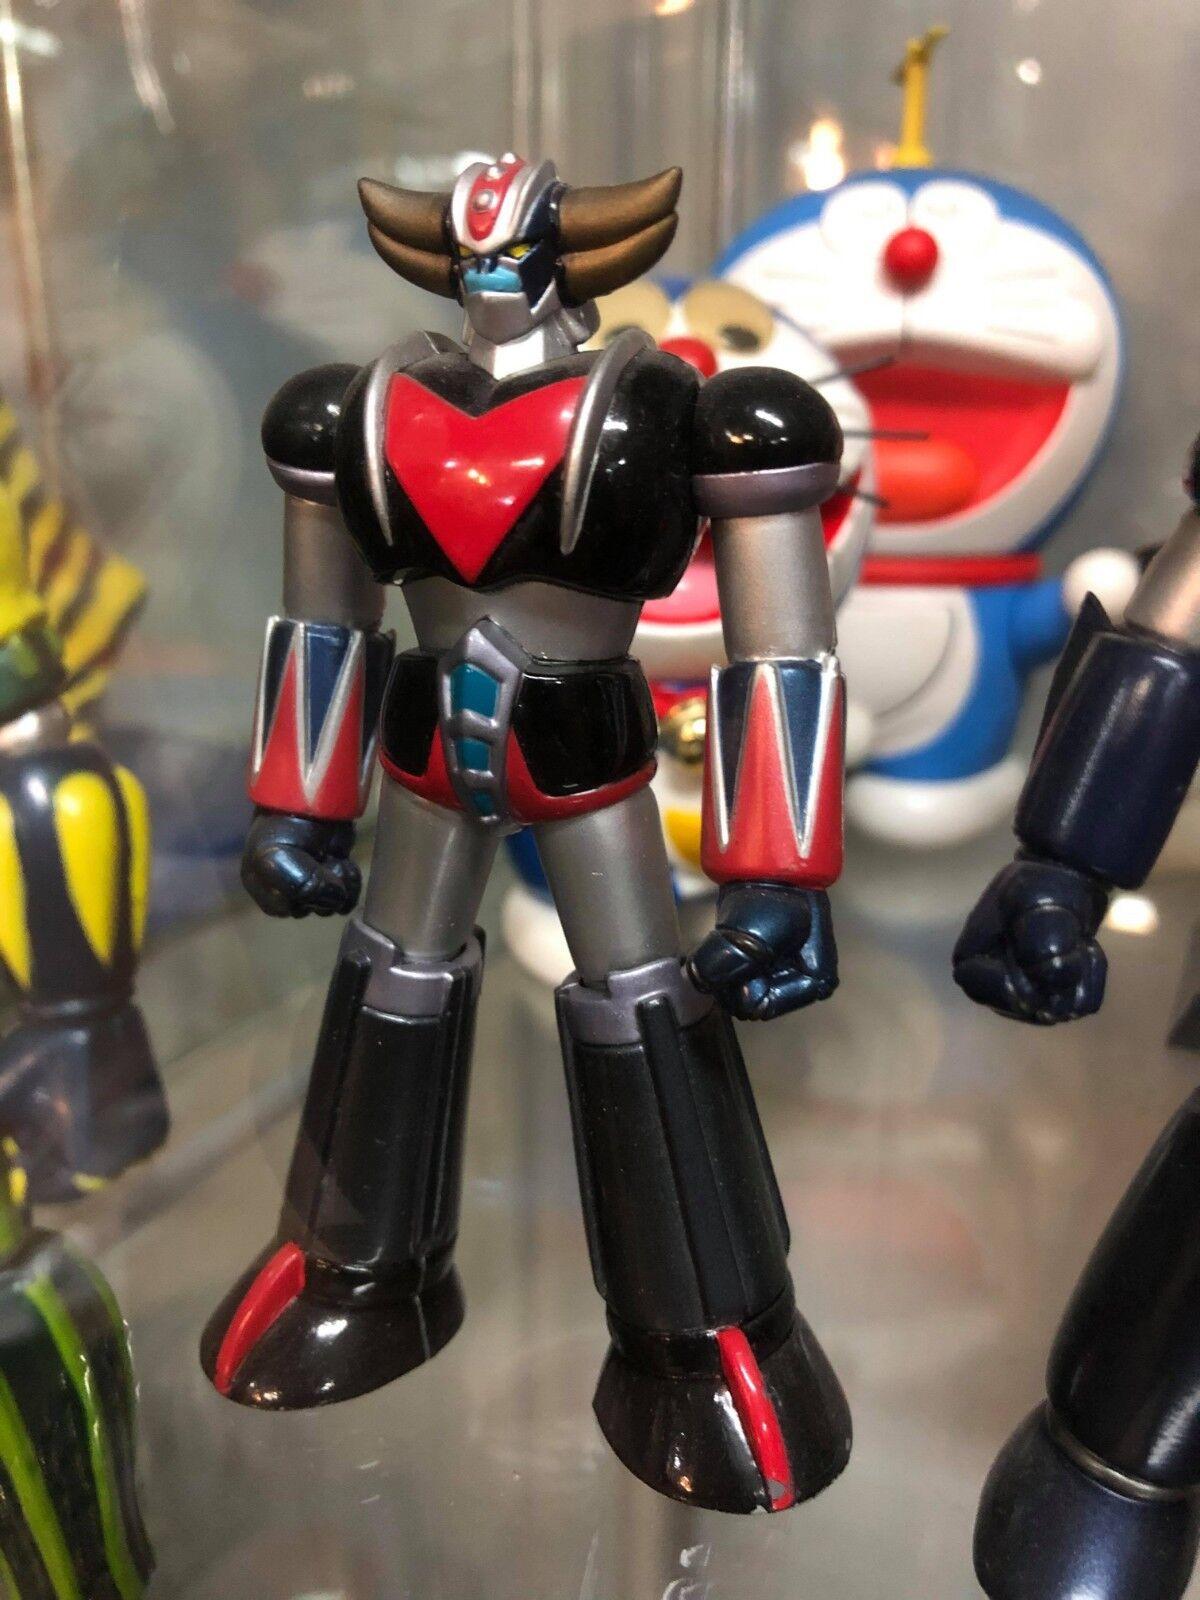 Hl pro Mini Metal Ovni Robot Grendizer goldrake Expuesto